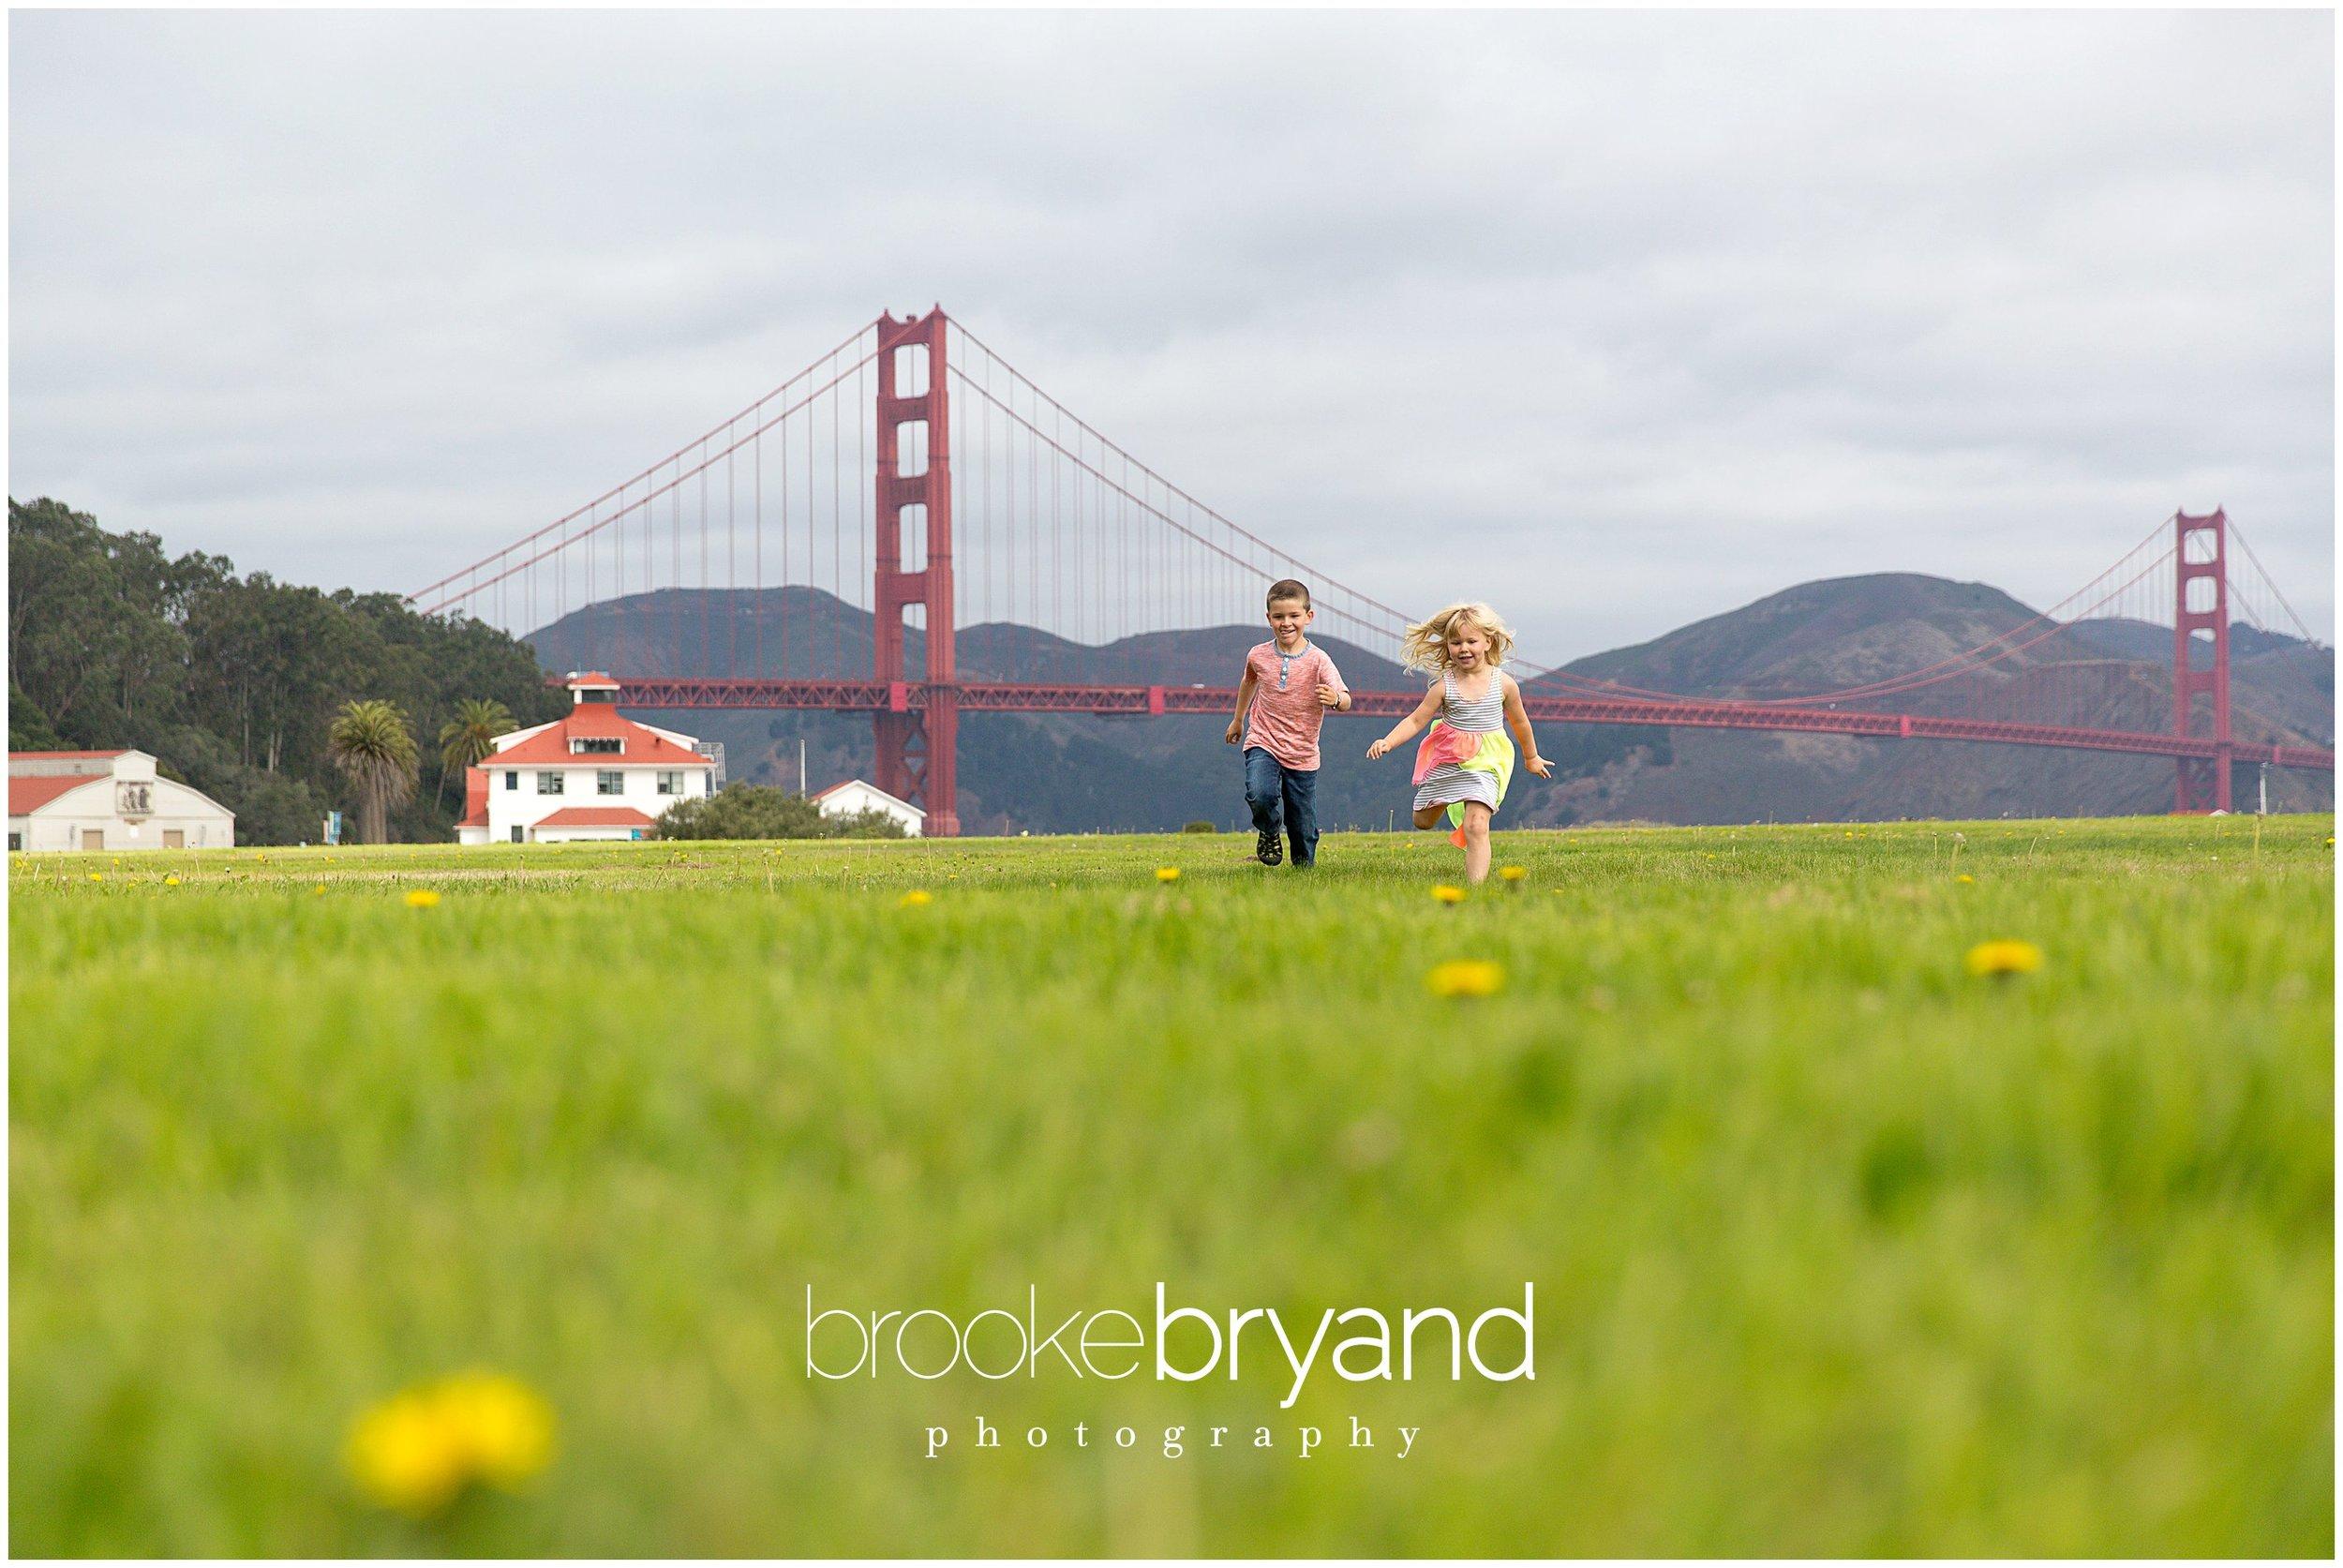 08.2014-Duma-Crissy-Field-Golden-Gate-Bridge-Family-Photography-BBP_0732_San-Francisco-Family-Photos-Brooke-Bryand-Photography.jpg